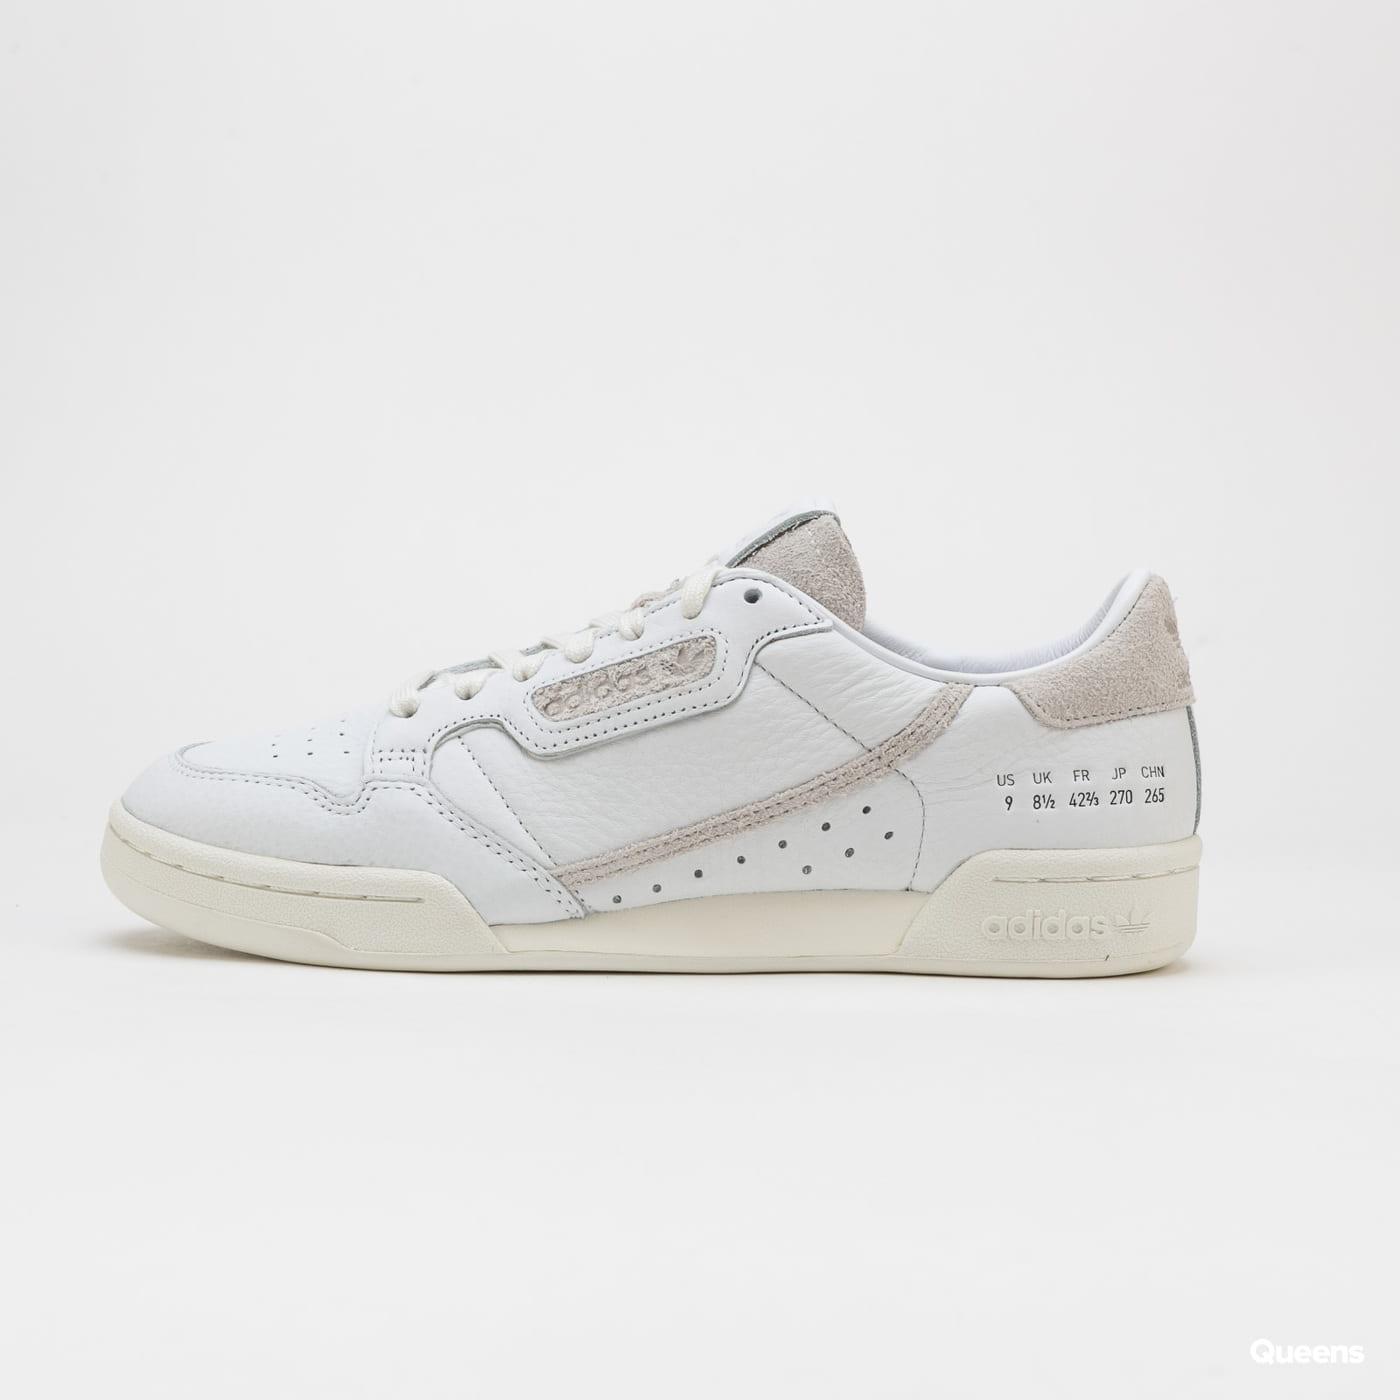 adidas Originals Continental 80 ftwwht /crywht / owhite